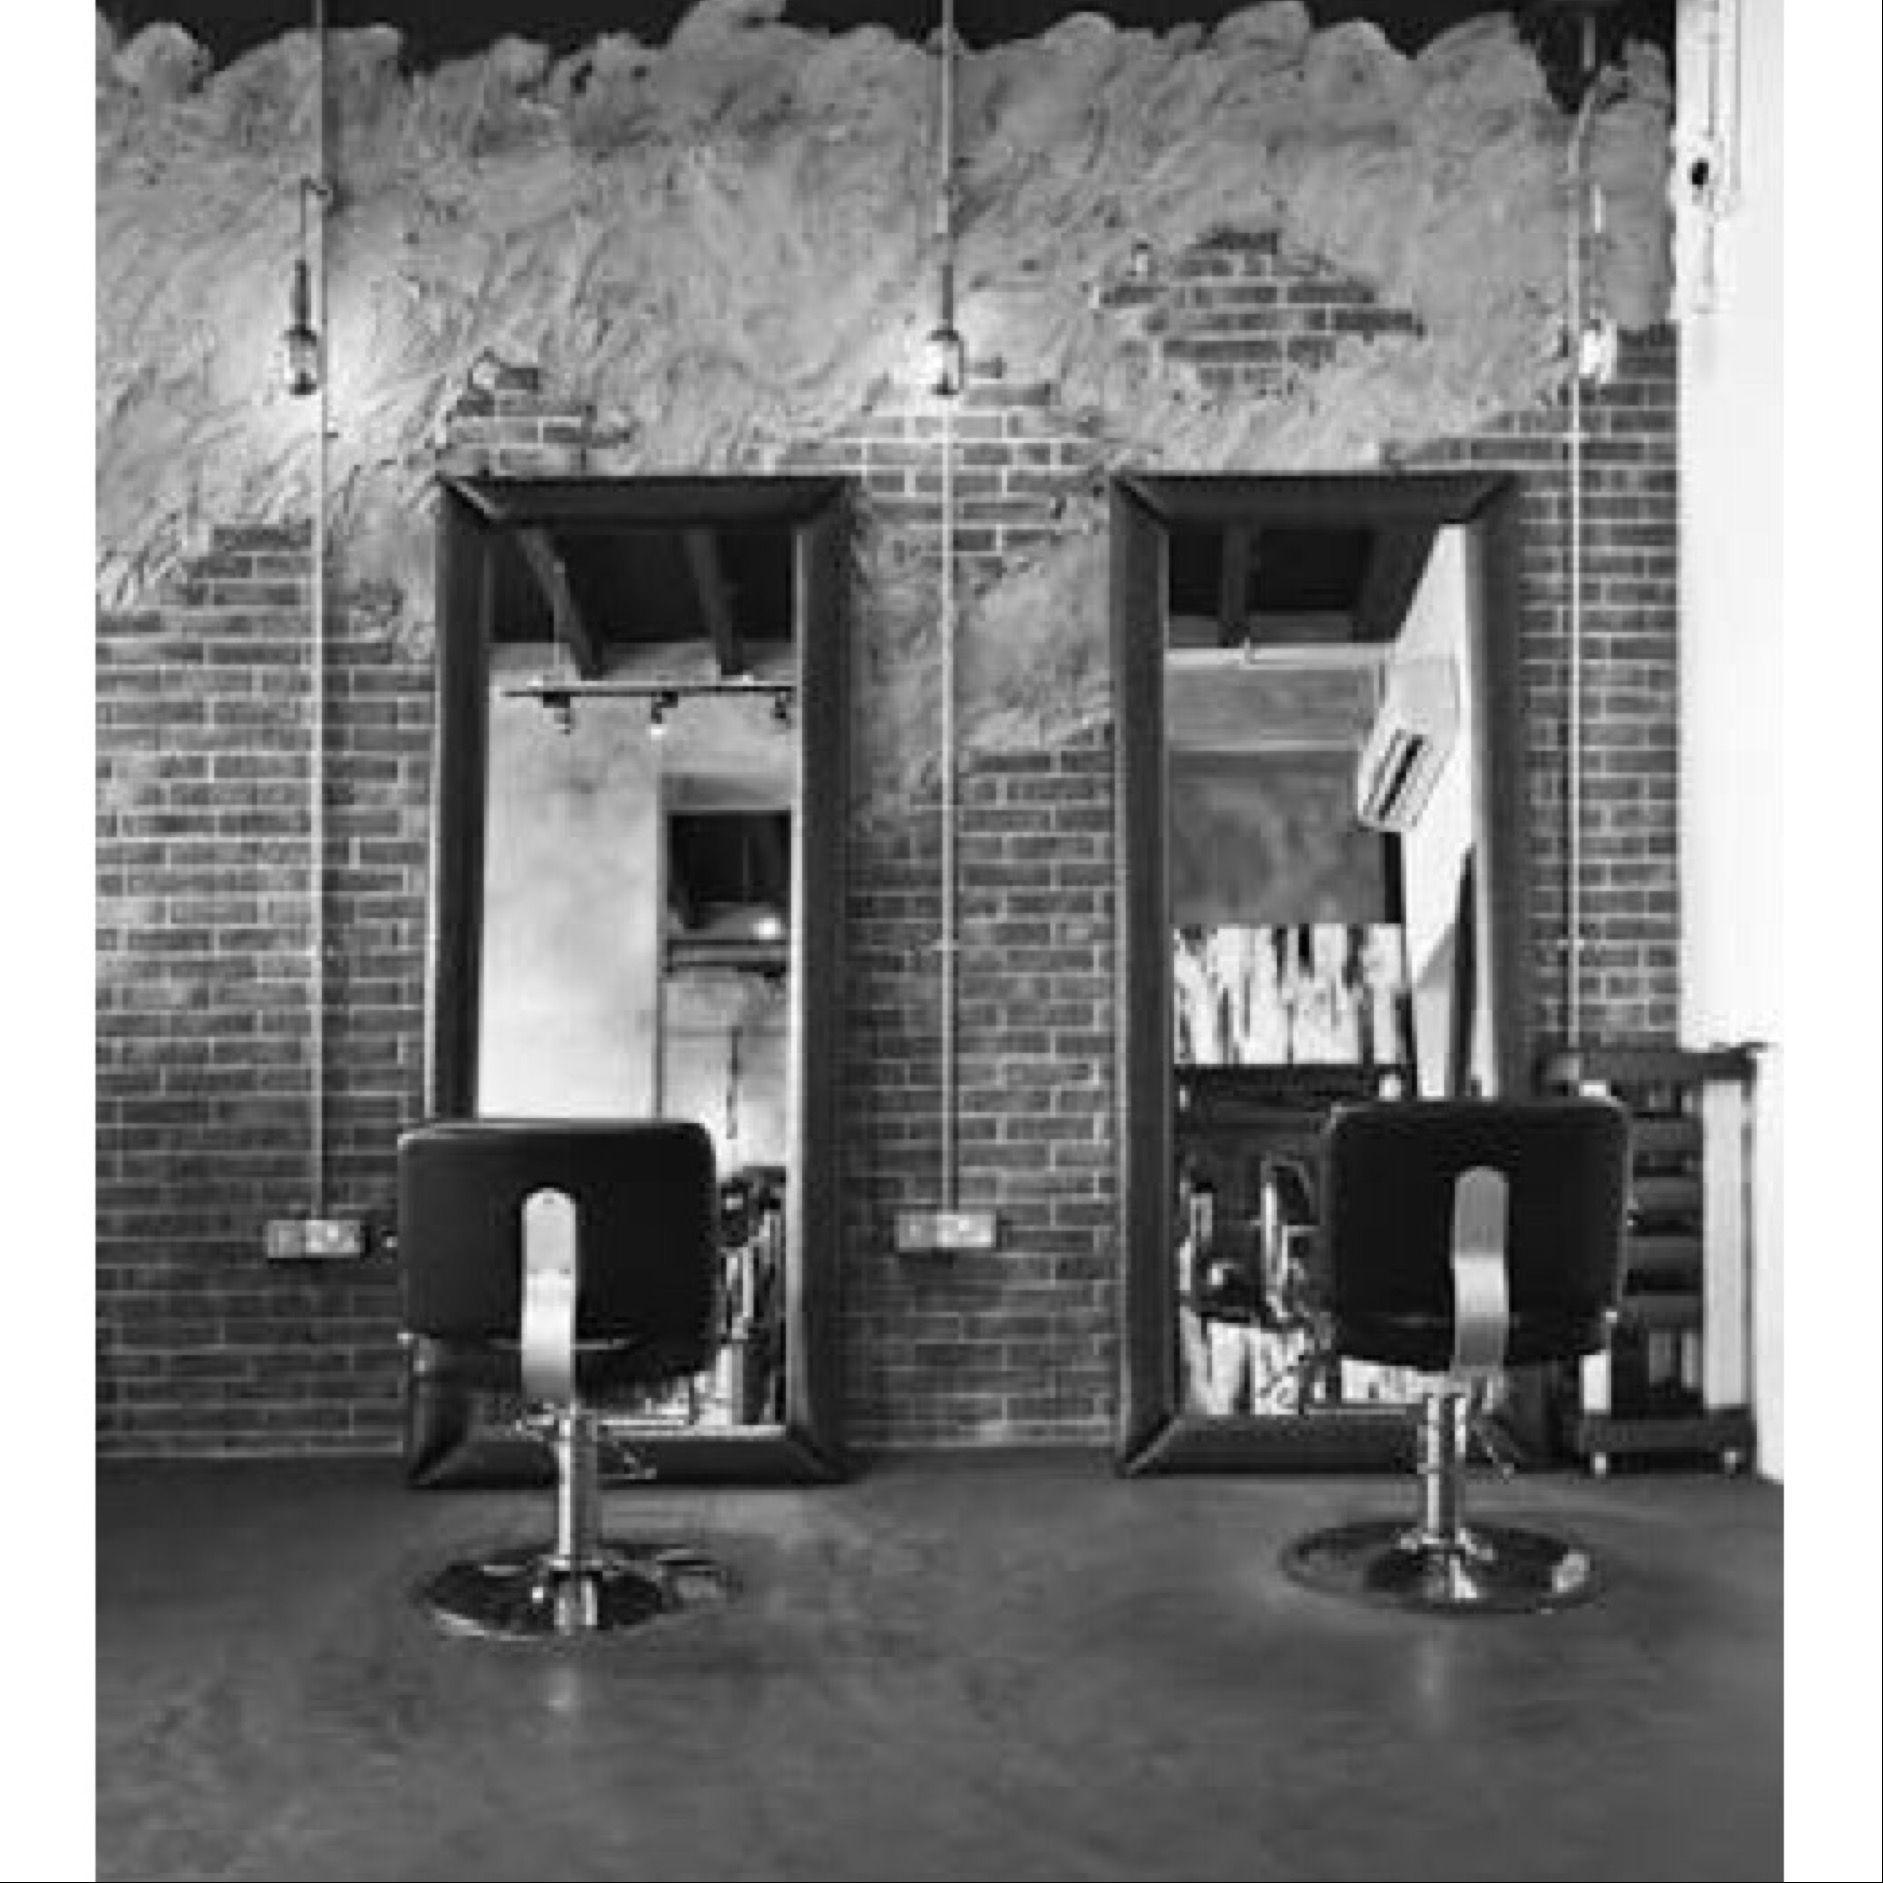 interior design furniture minimalism industrial design. salon interior, bricks and mirrors, minimalism. industrial design interior furniture minimalism b